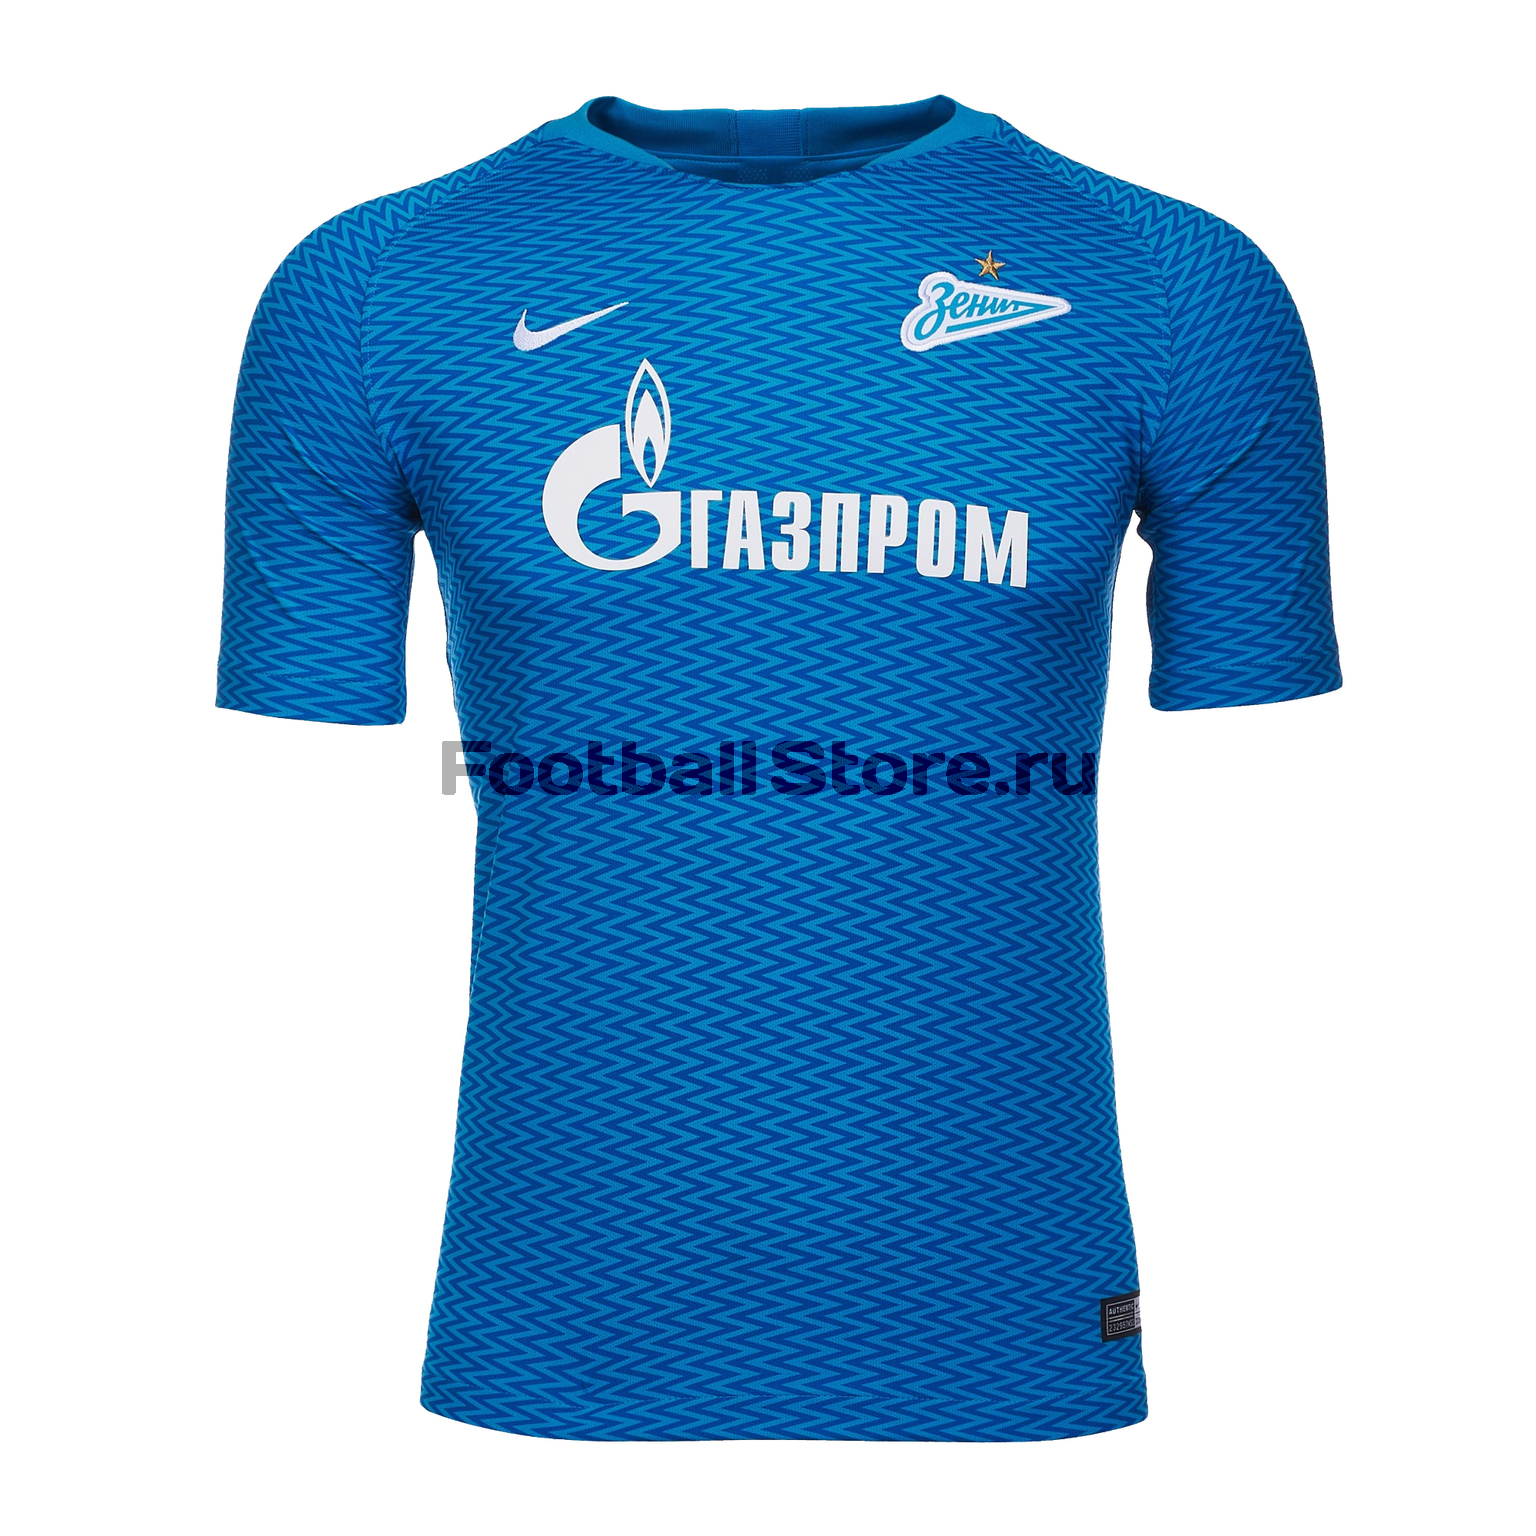 "Подростковая домашняя футболка Nike ФК ""Зенит"" 2018/2019"